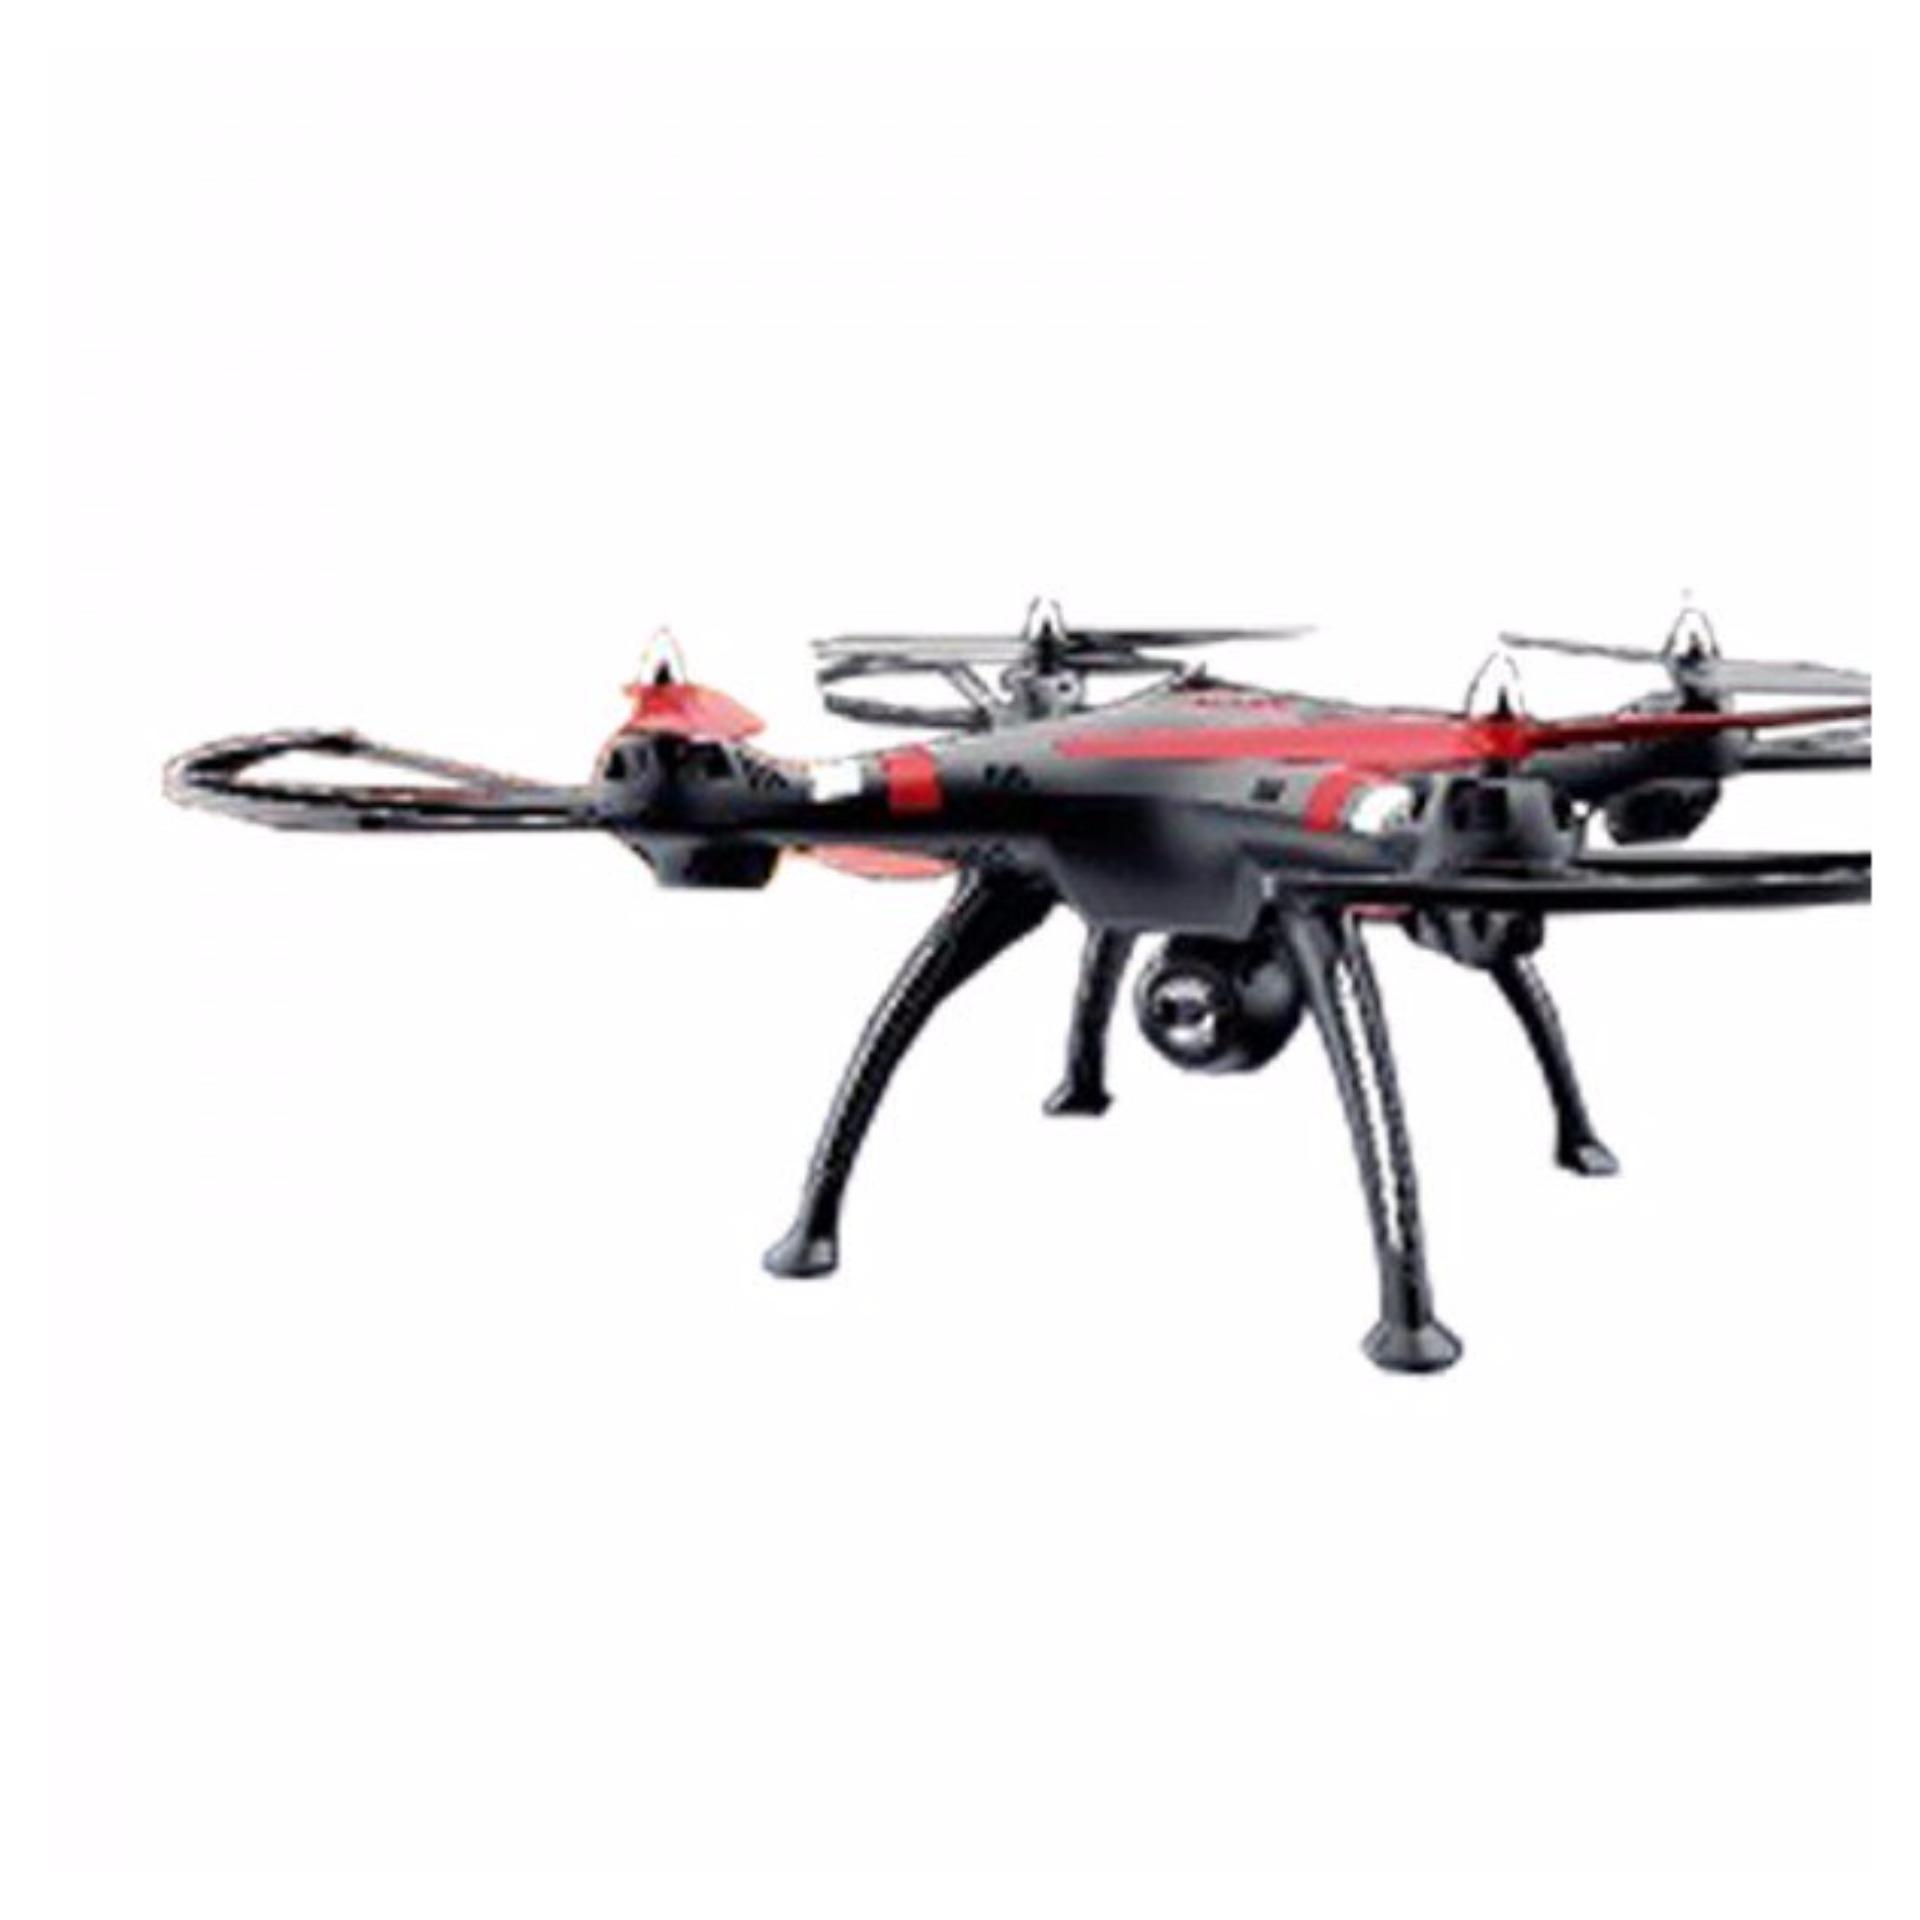 Samurai Jupiter Red/Black Camera Drone R/C QUADCOPTER